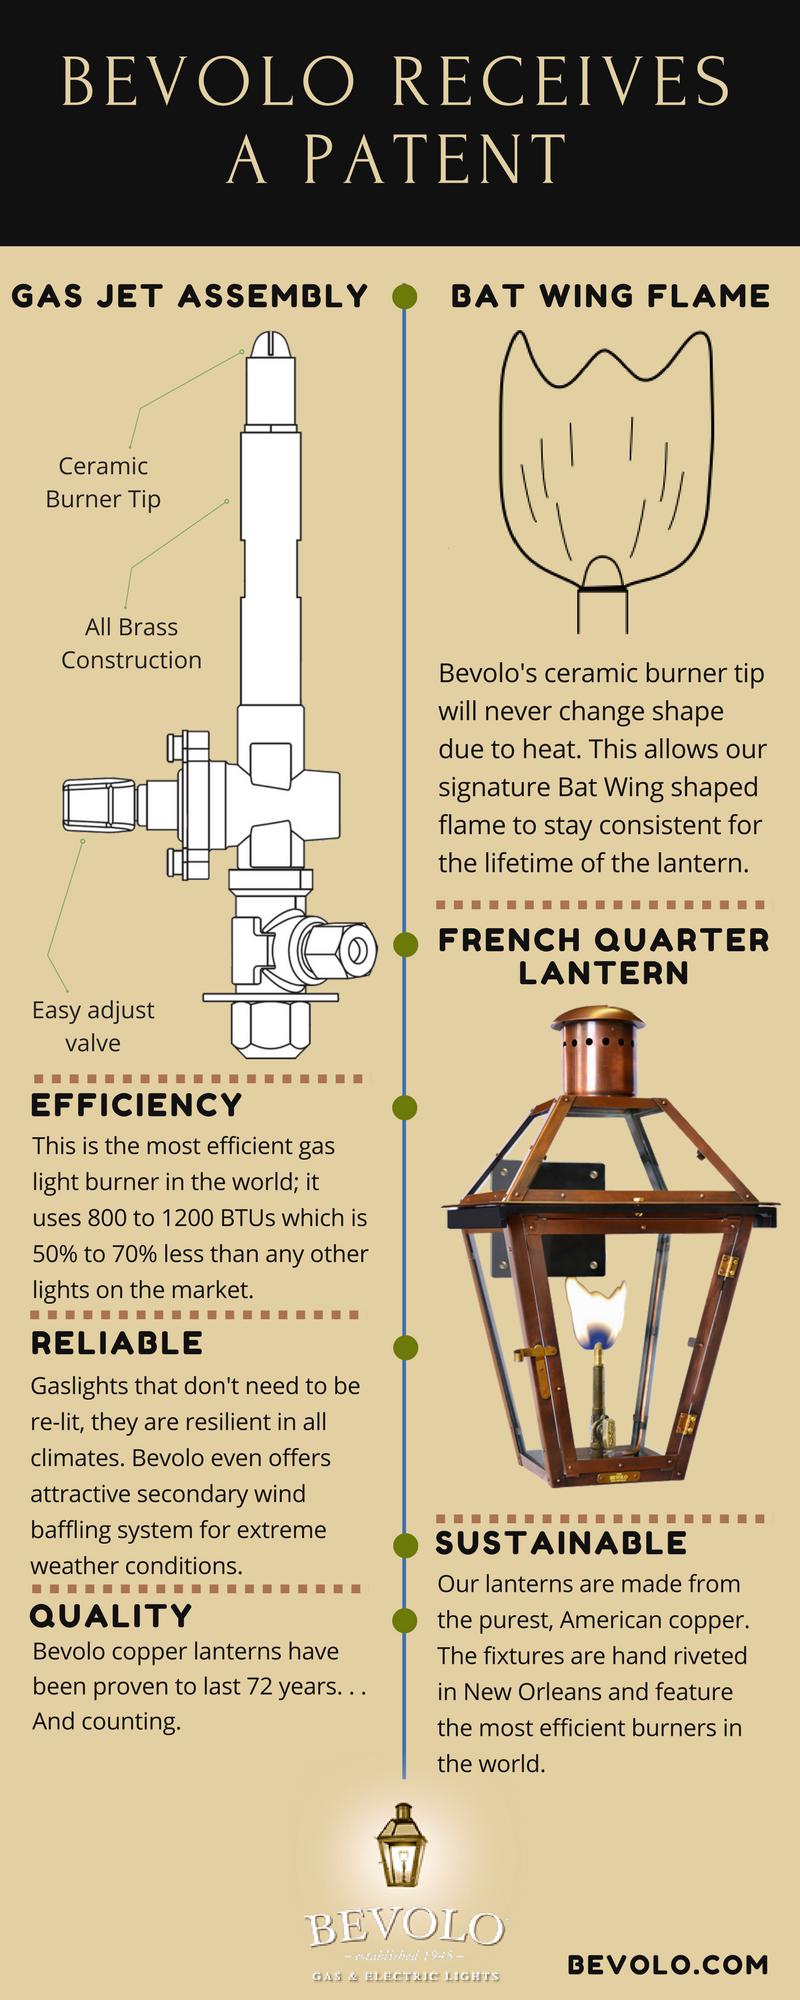 Pin By Bevolo On Bevolo History Bevolo Gas Lanterns Gas